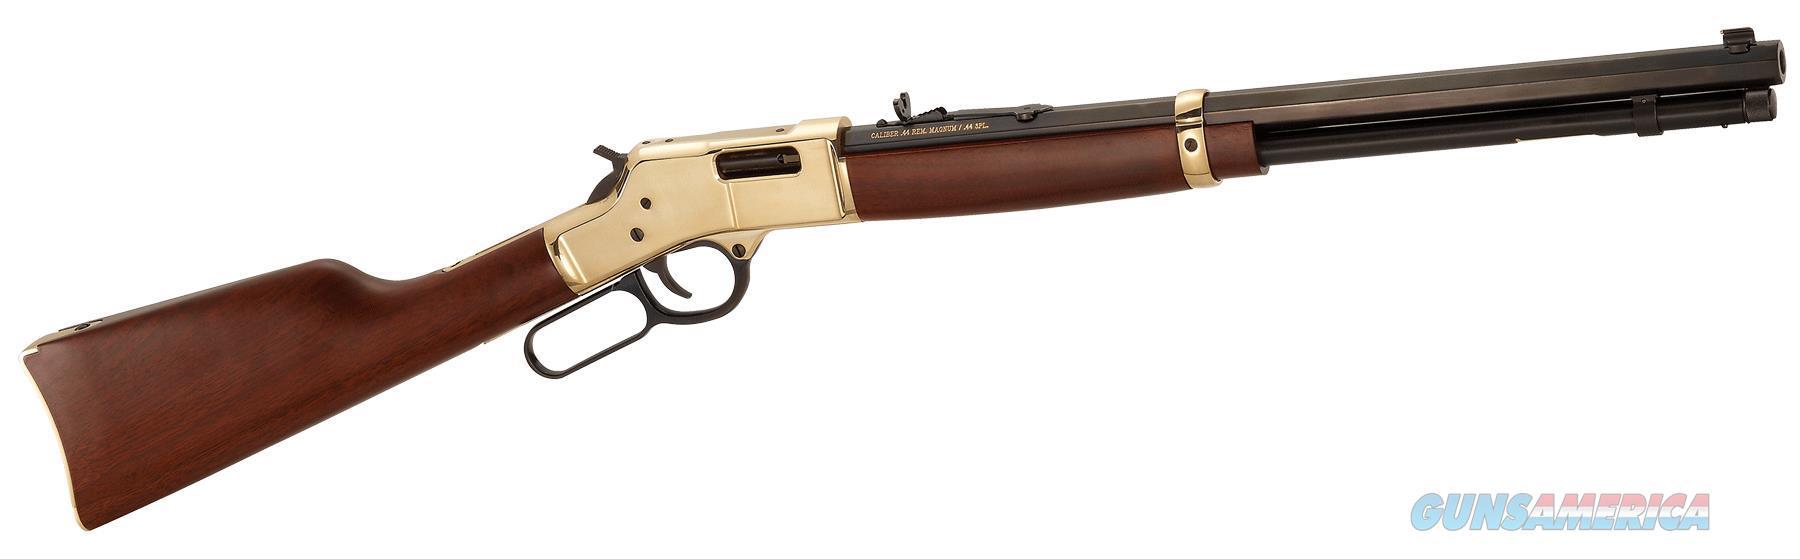 "Henry Big Boy Brass .41 Magnum 20"" Octagon 10 Rds H006M41   Guns > Rifles > Henry Rifle Company"